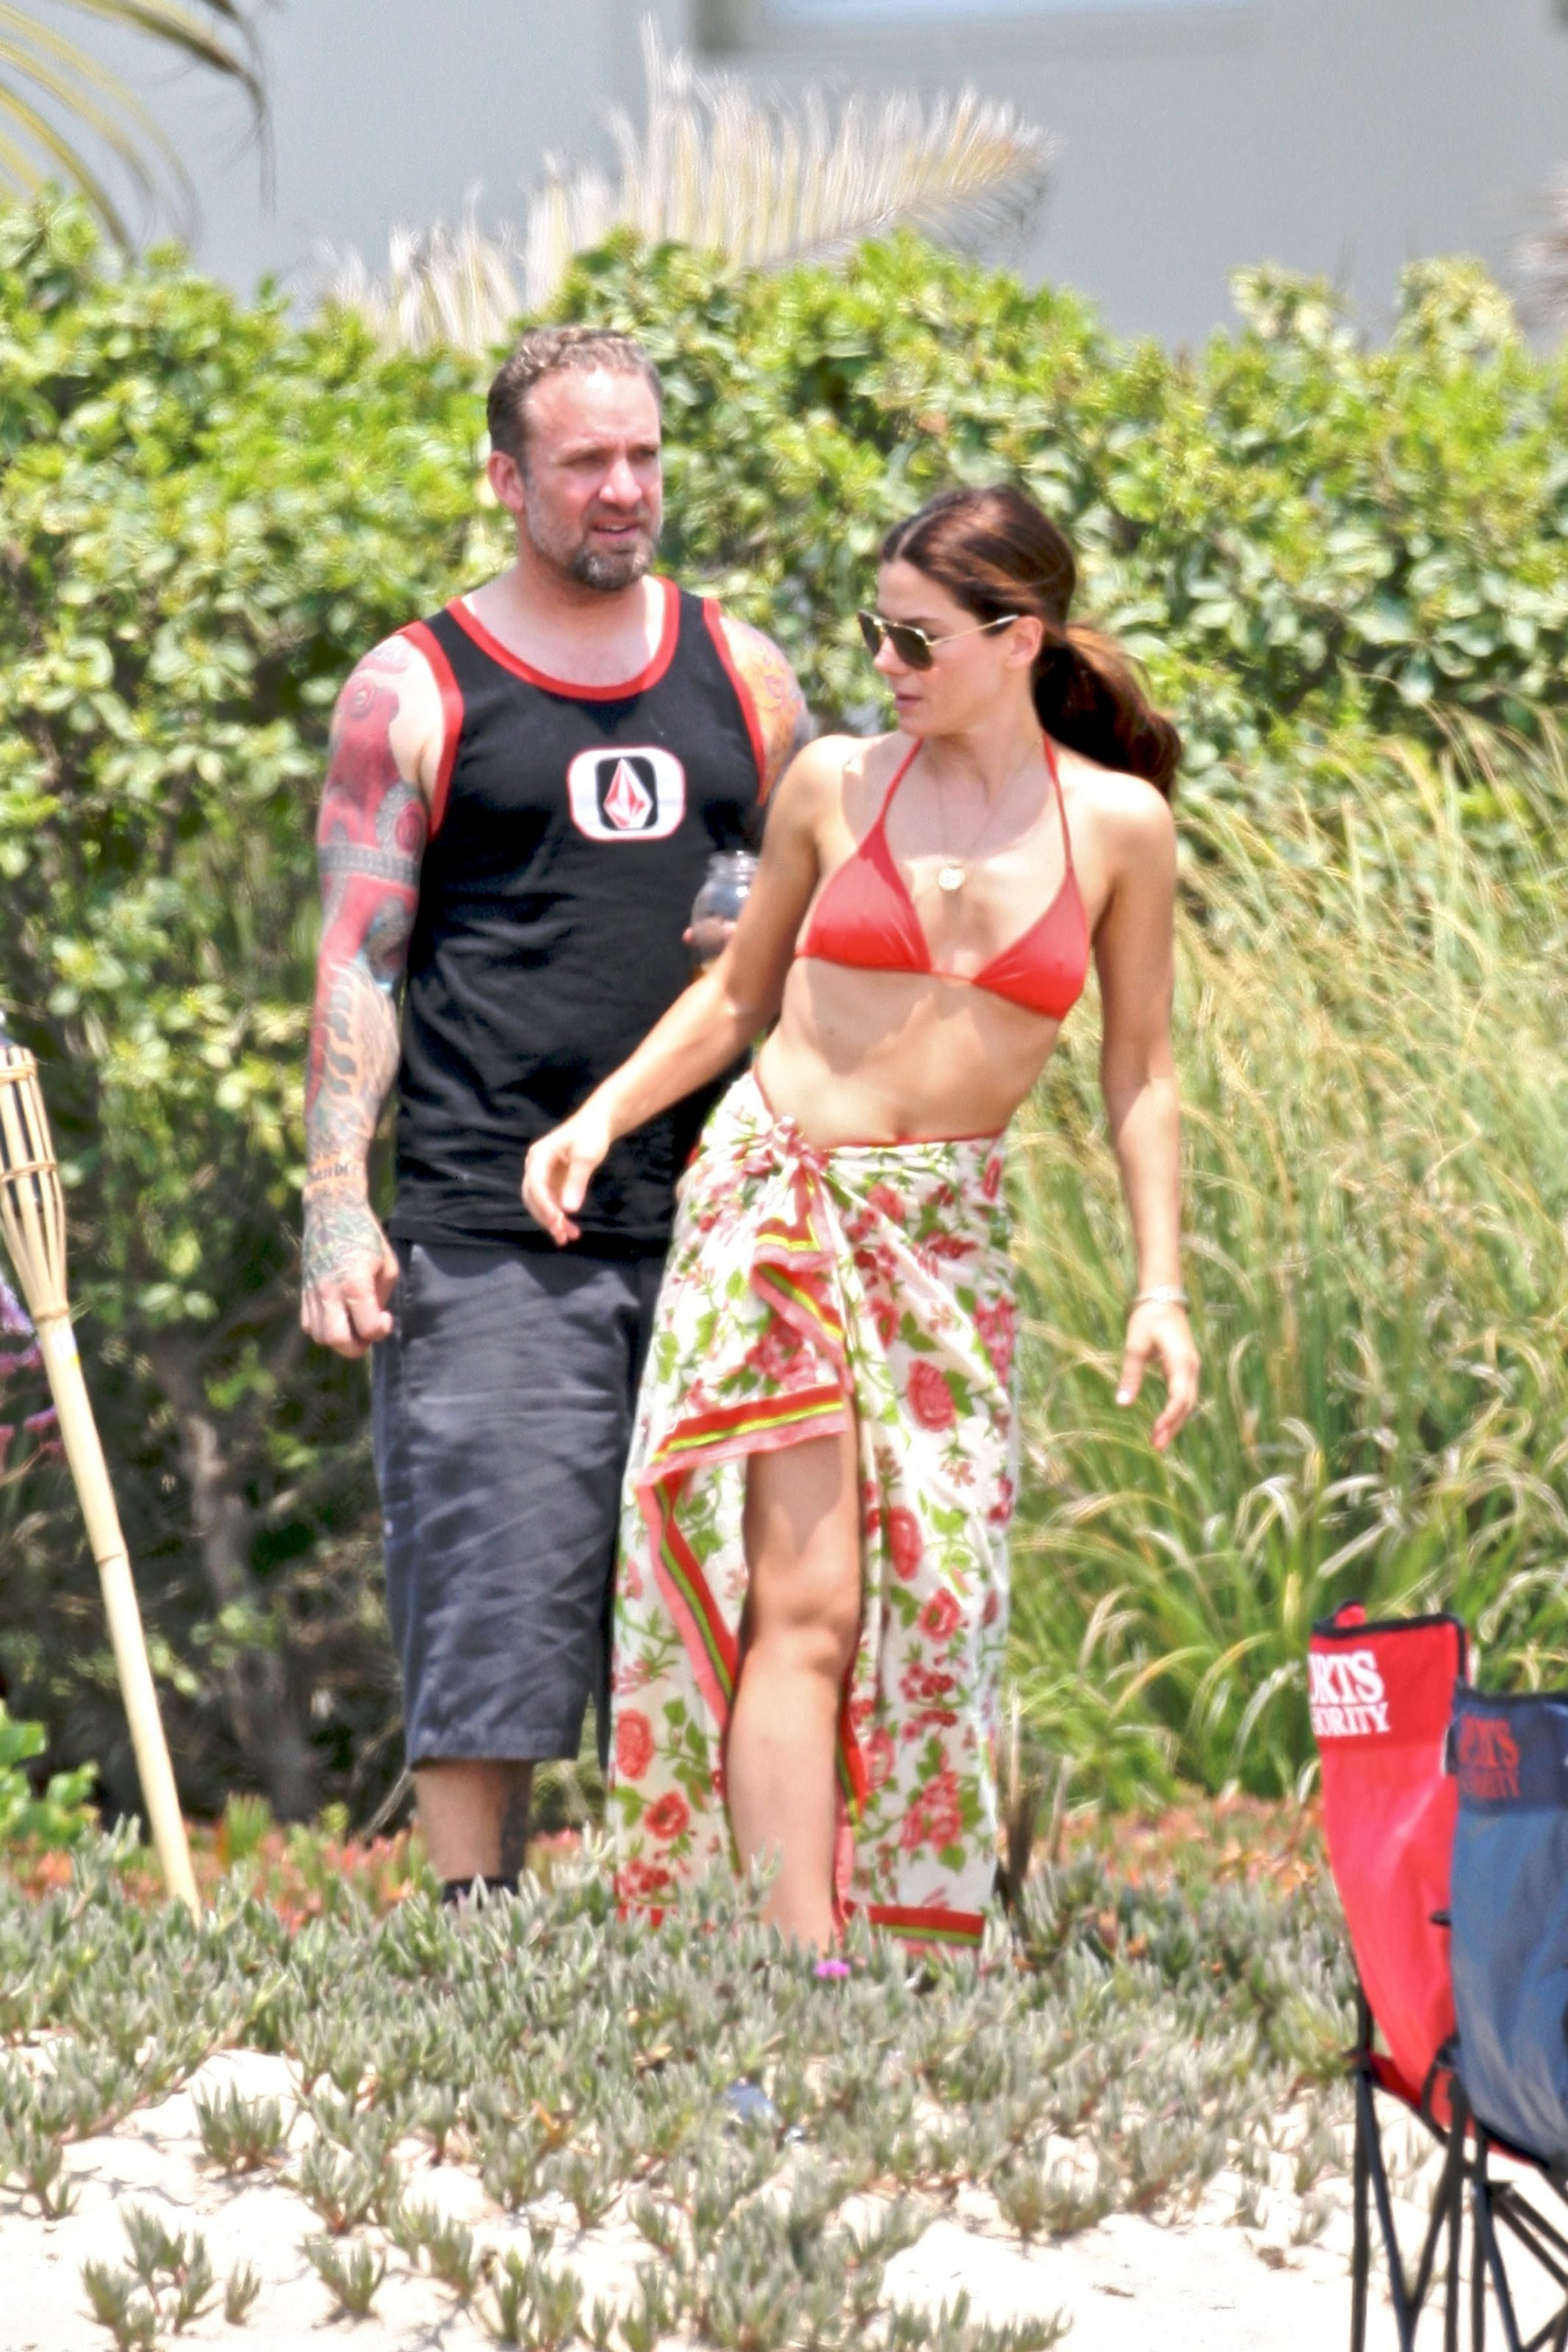 79625_Celebutopia-Sandra_Bullock_in_top_bikini_and_husband_host_an_Independence_Day_beach_party-02_122_1146lo.jpg